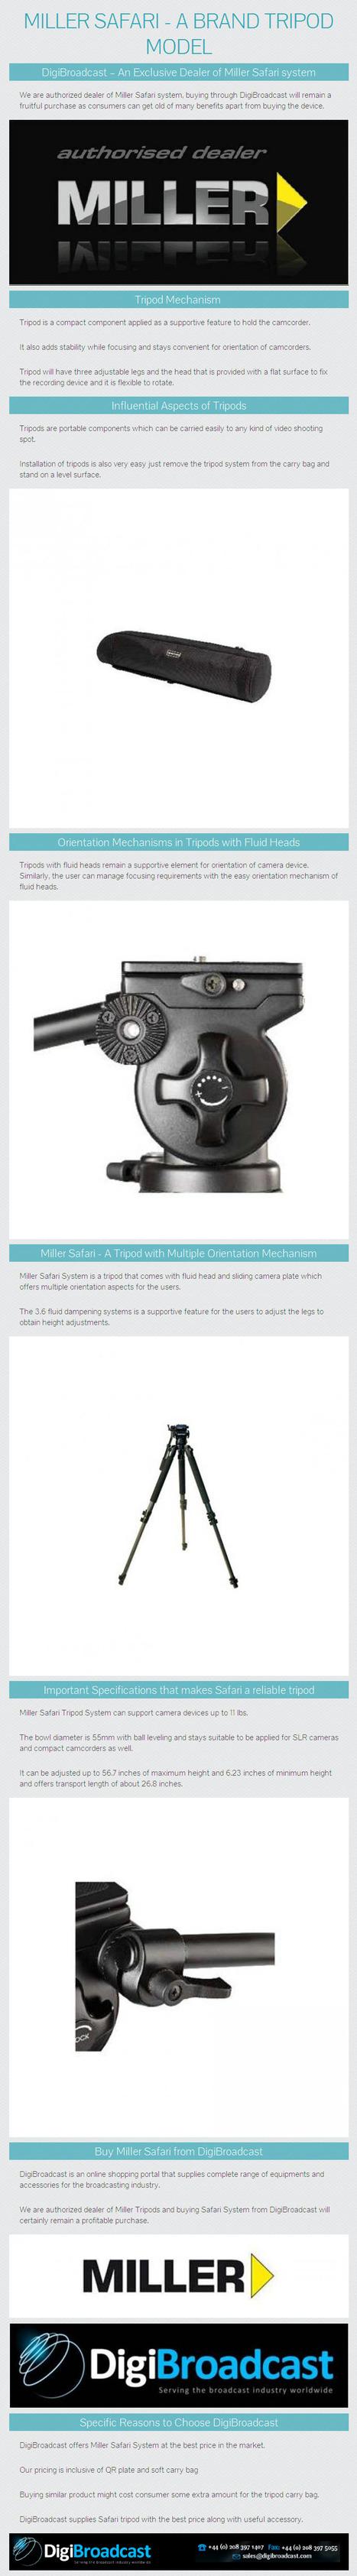 Miller Safari - A Brand Tripod Model from www.digibroadcast.com | digibroadcast | Scoop.it